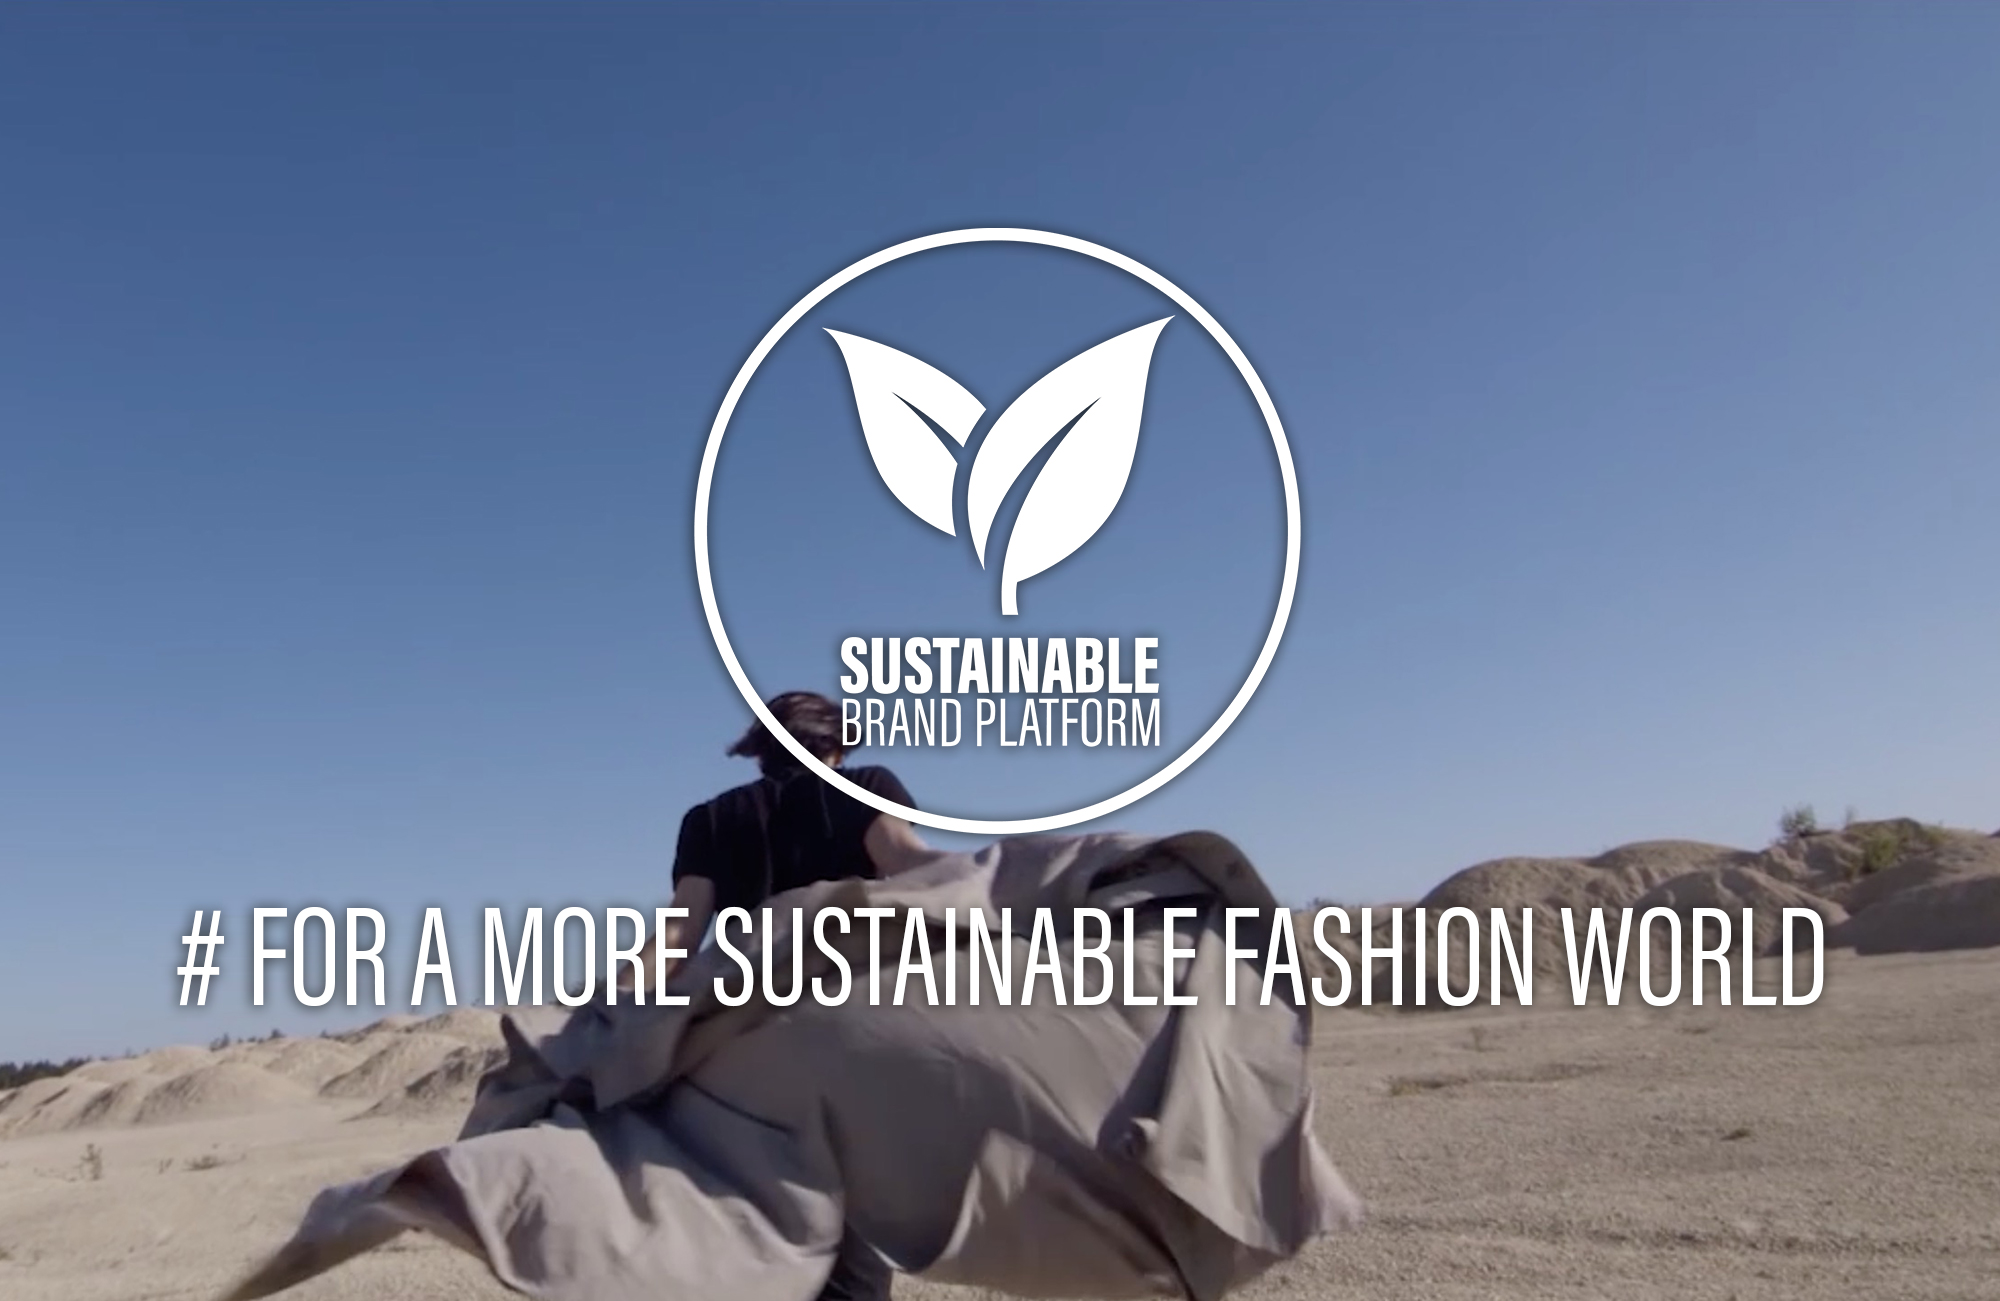 Sustainable Brand Platform.